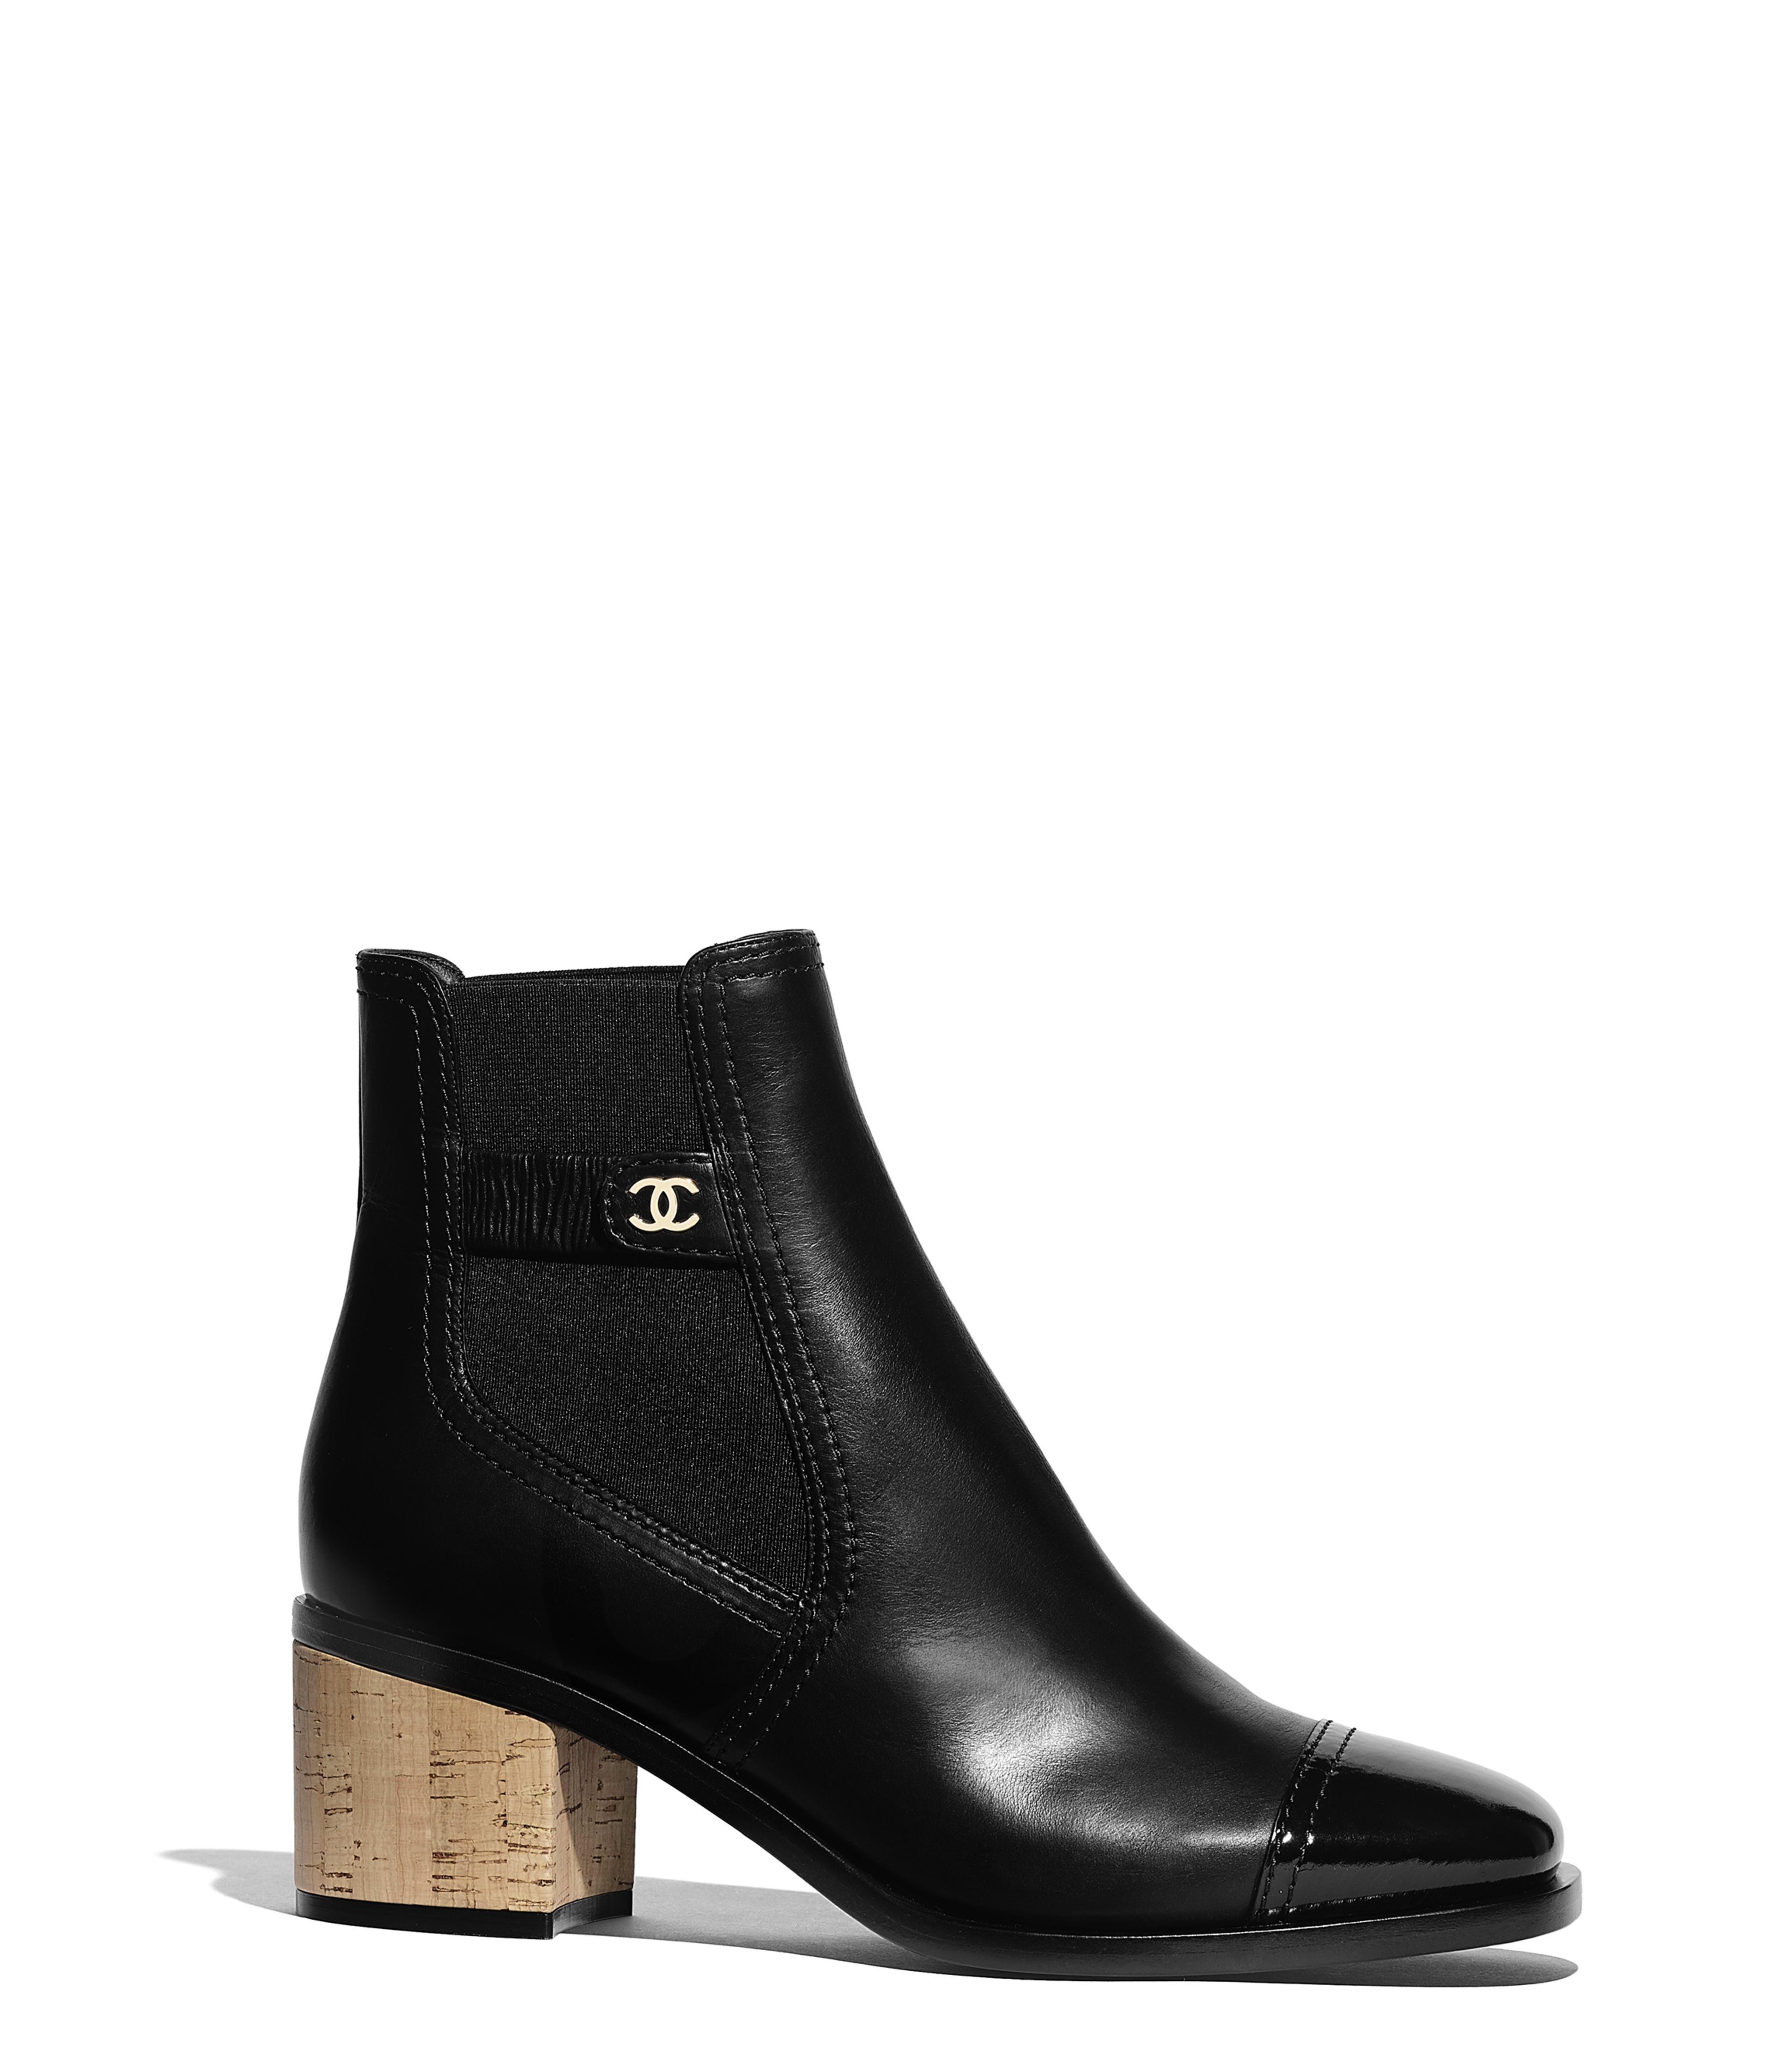 022e479c824f60 Ankle Boots Calfskin, Patent Calfskin & Cork, Black Ref. G35046Y5333794305